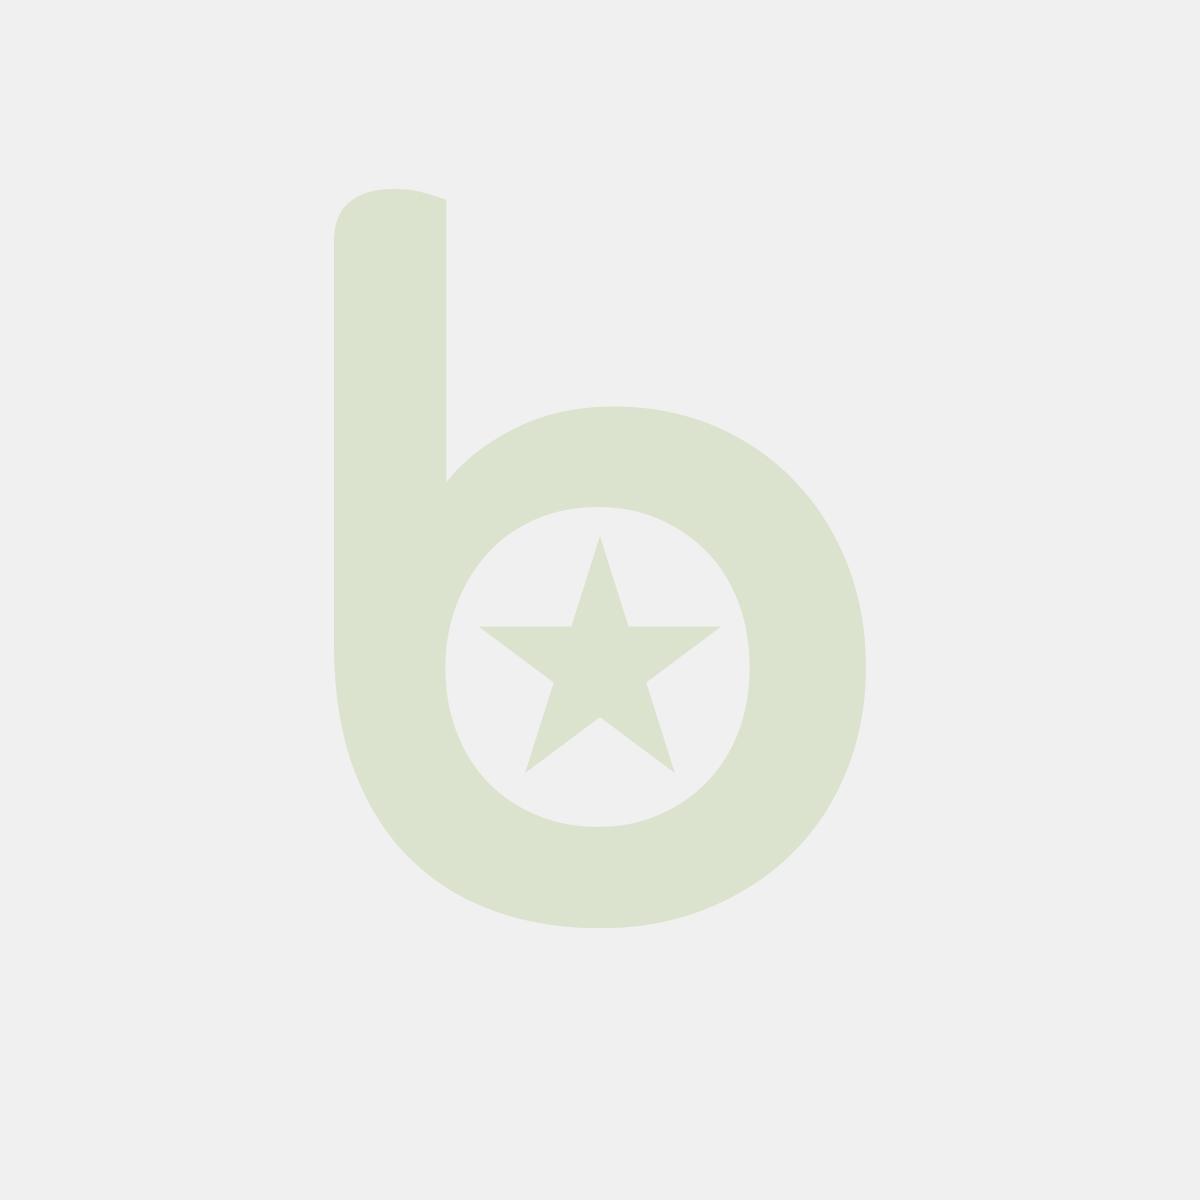 Tasak Kitchen Line - kod produktu 781302